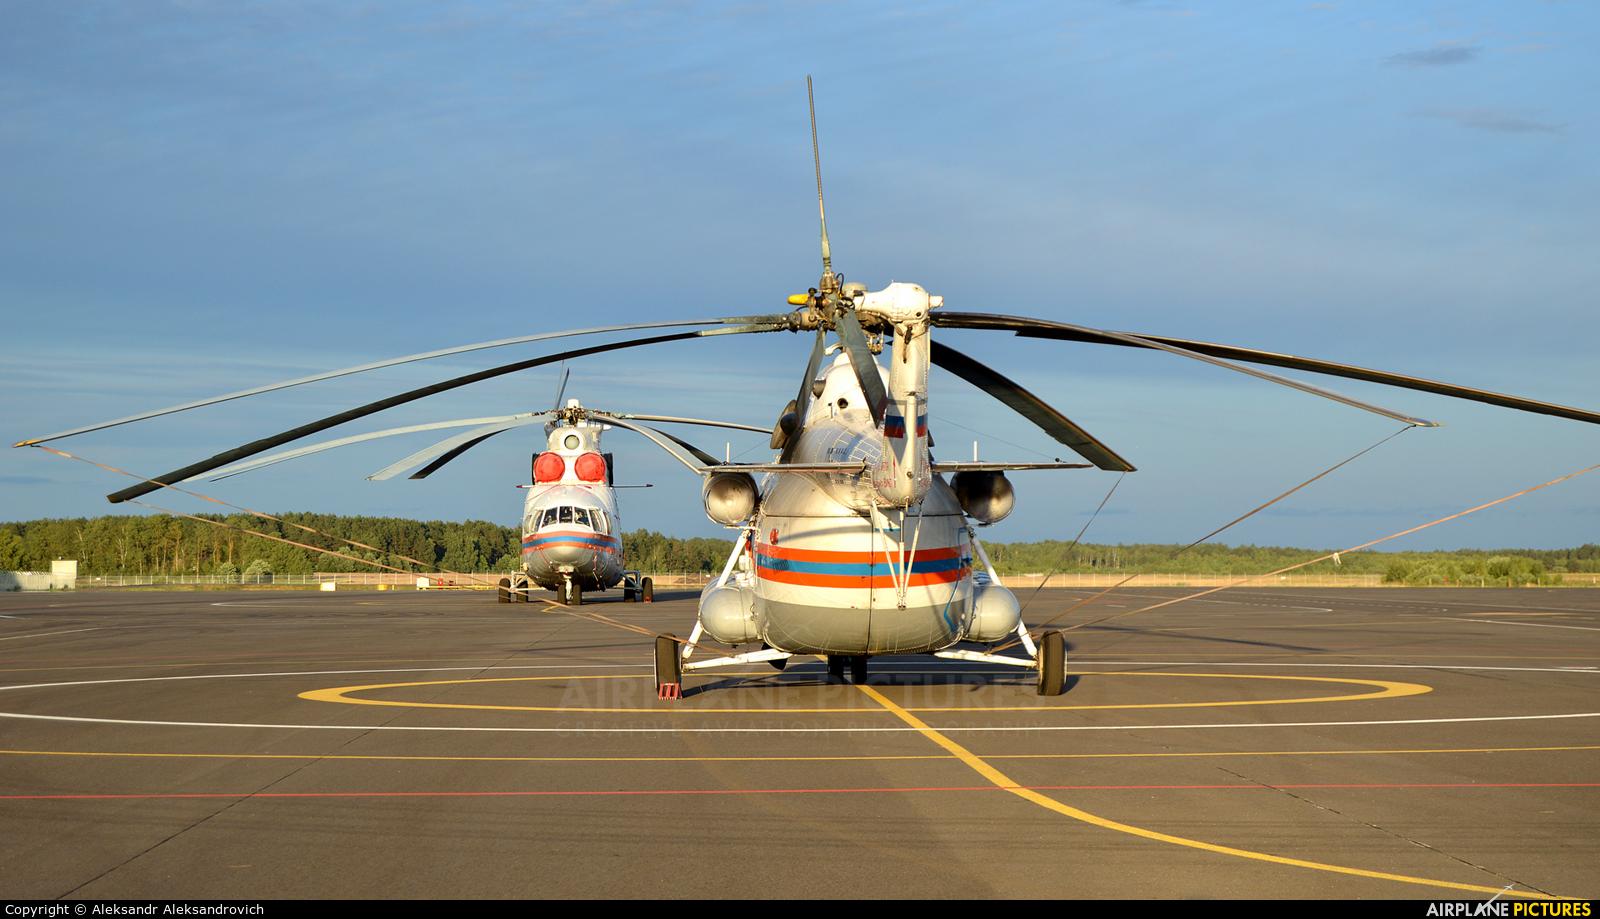 Russia - МЧС России EMERCOM RF-32831 aircraft at Brest Airport